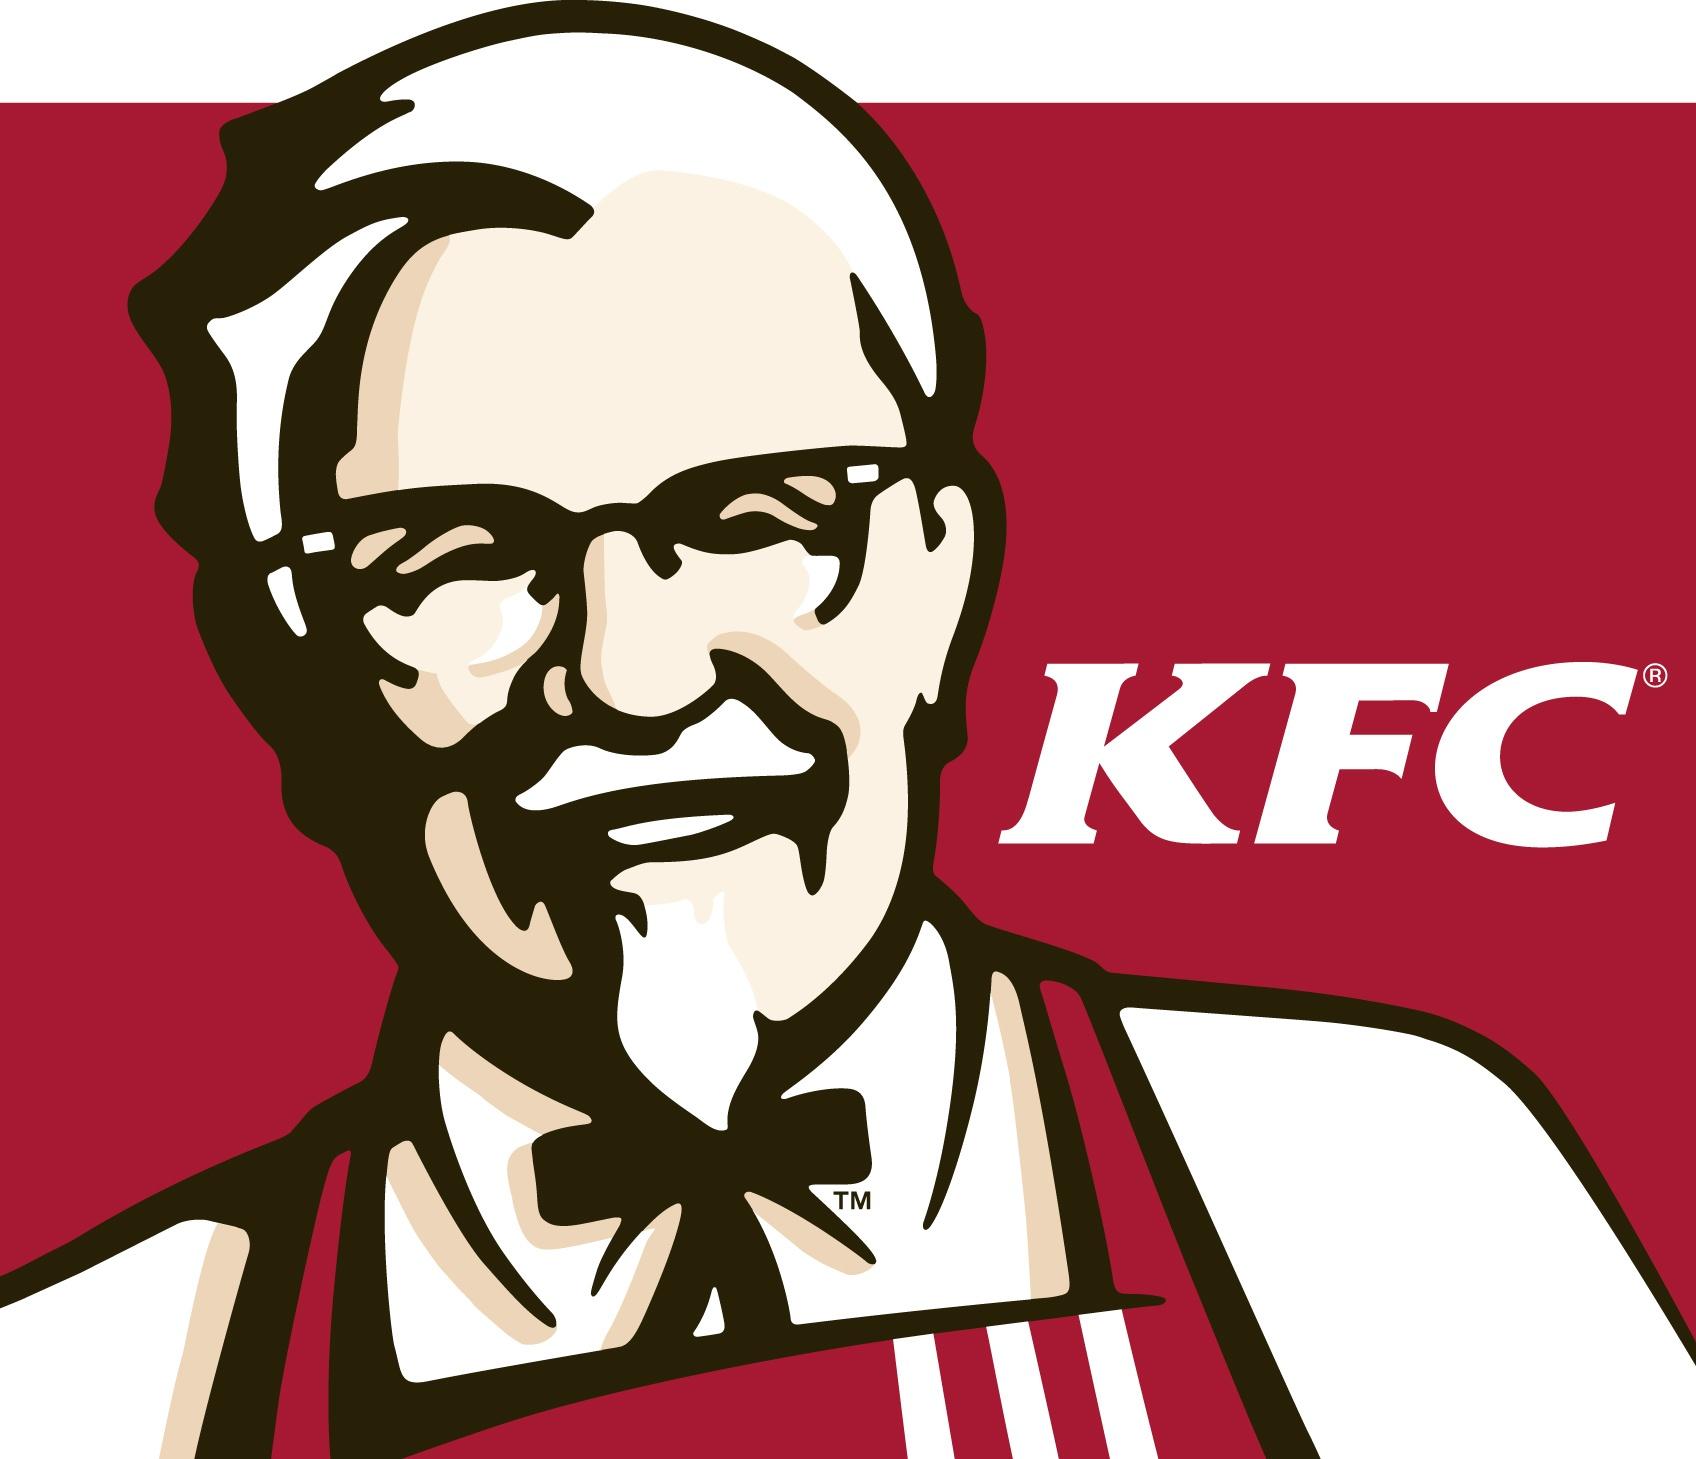 https://0201.nccdn.net/1_2/000/000/0bc/26a/KFC_Logo-1696x1459.jpg